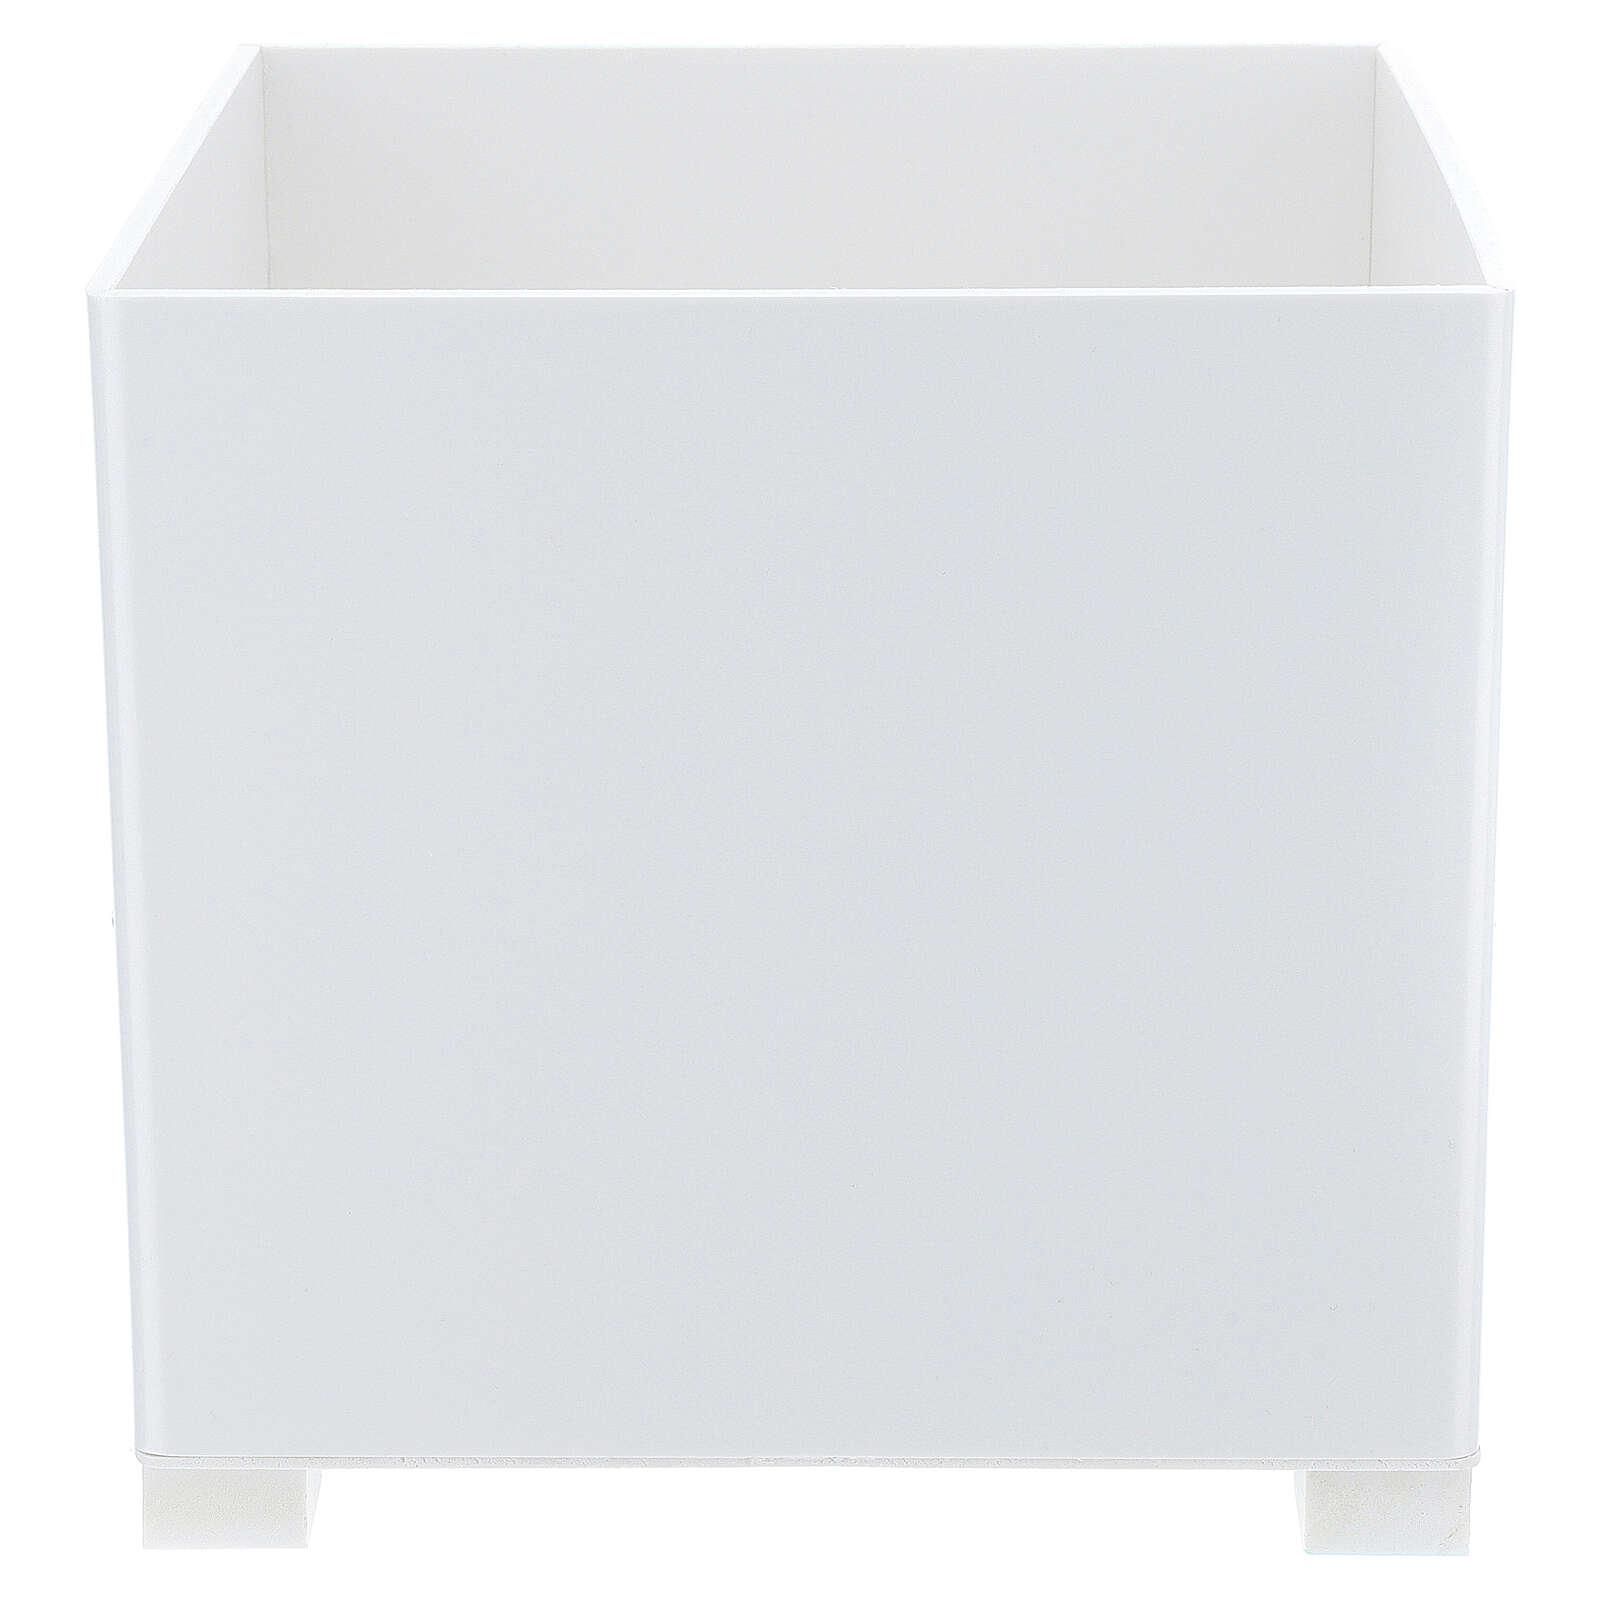 Forex glove basket for dispenser PF000003 3